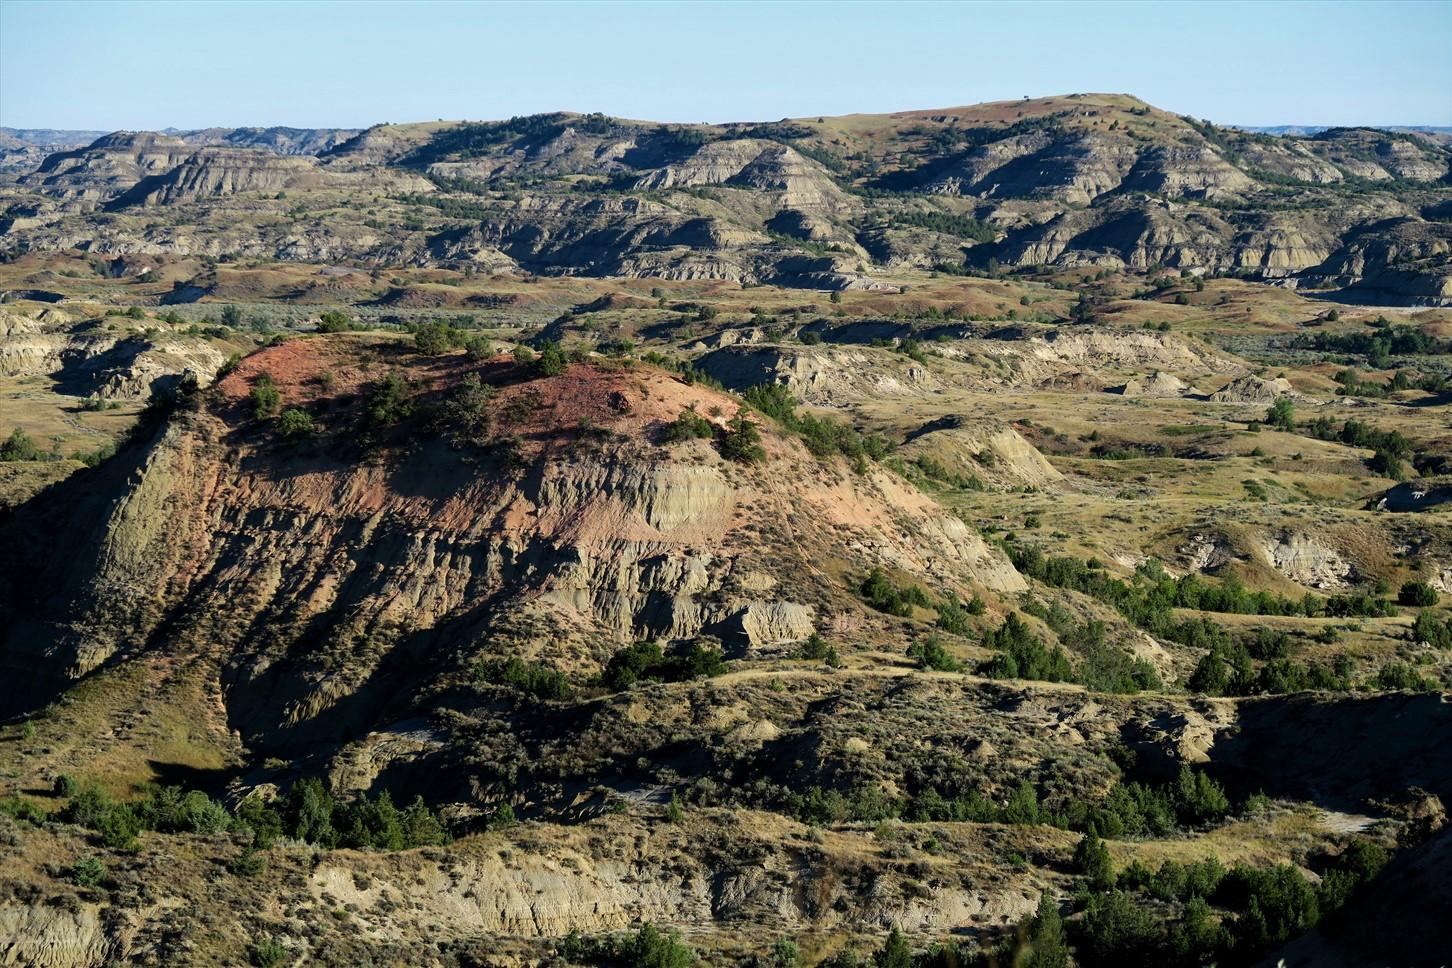 2015 09 08 19 Theodore Roosevelt National Park ND.jpg